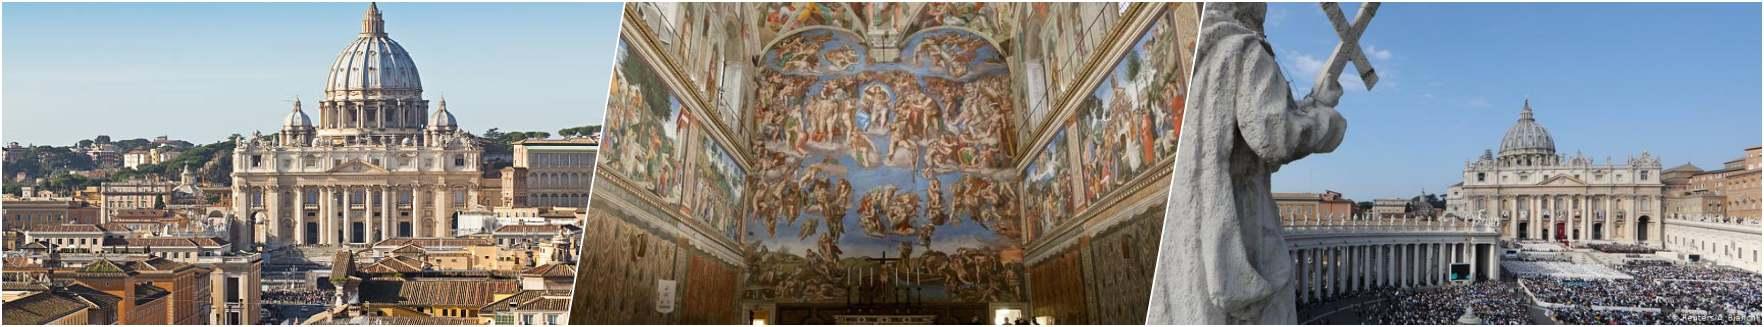 St. Peters Cathedral - Capela Sistina -Vatican Museum